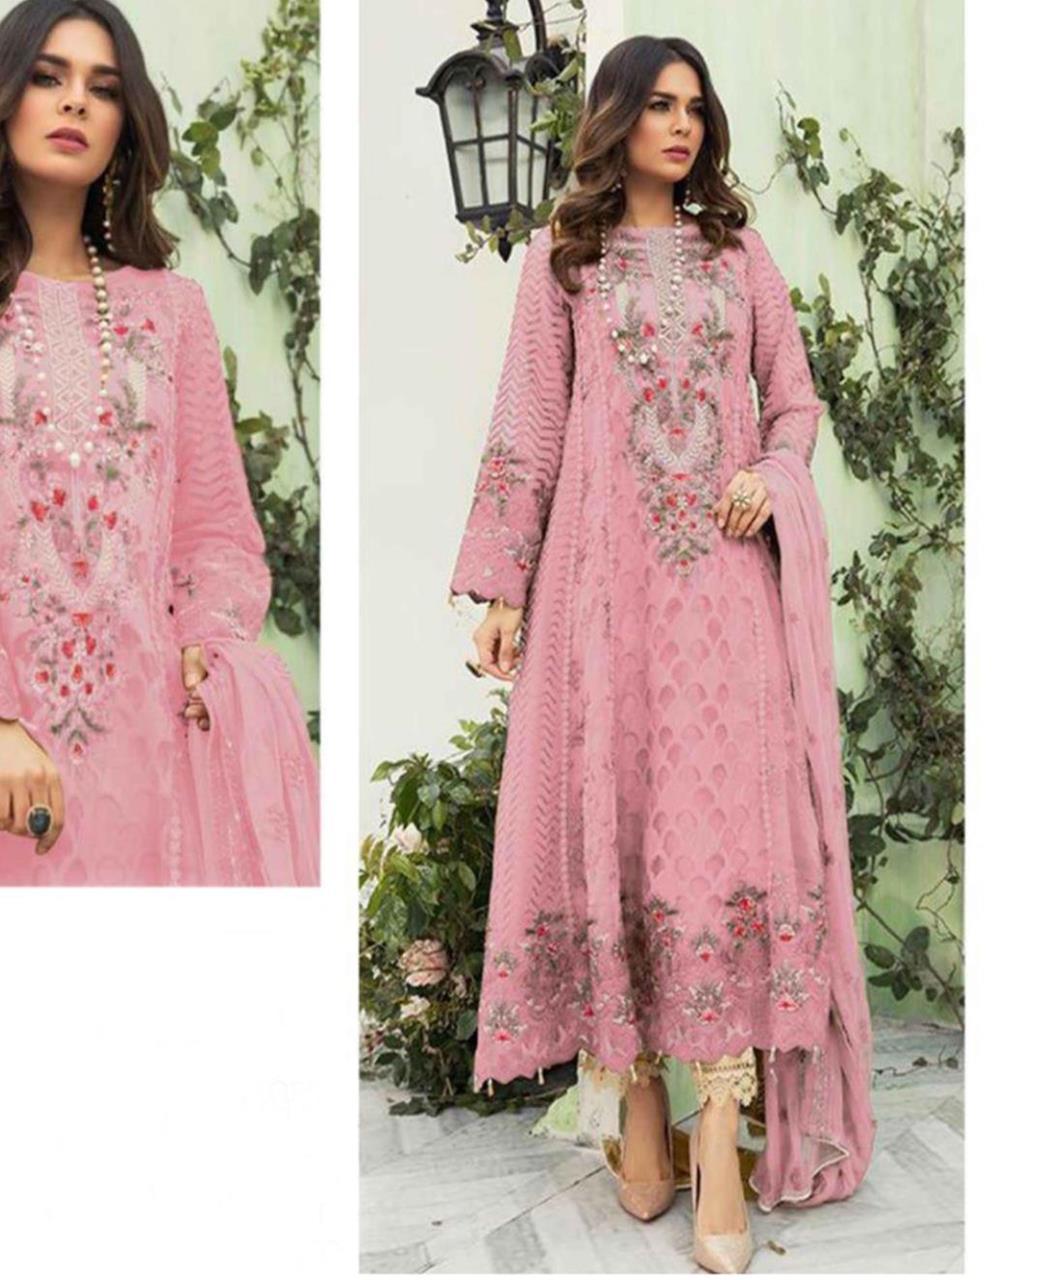 Embroidered Georgette Straight cut Salwar Kameez in Light Pink